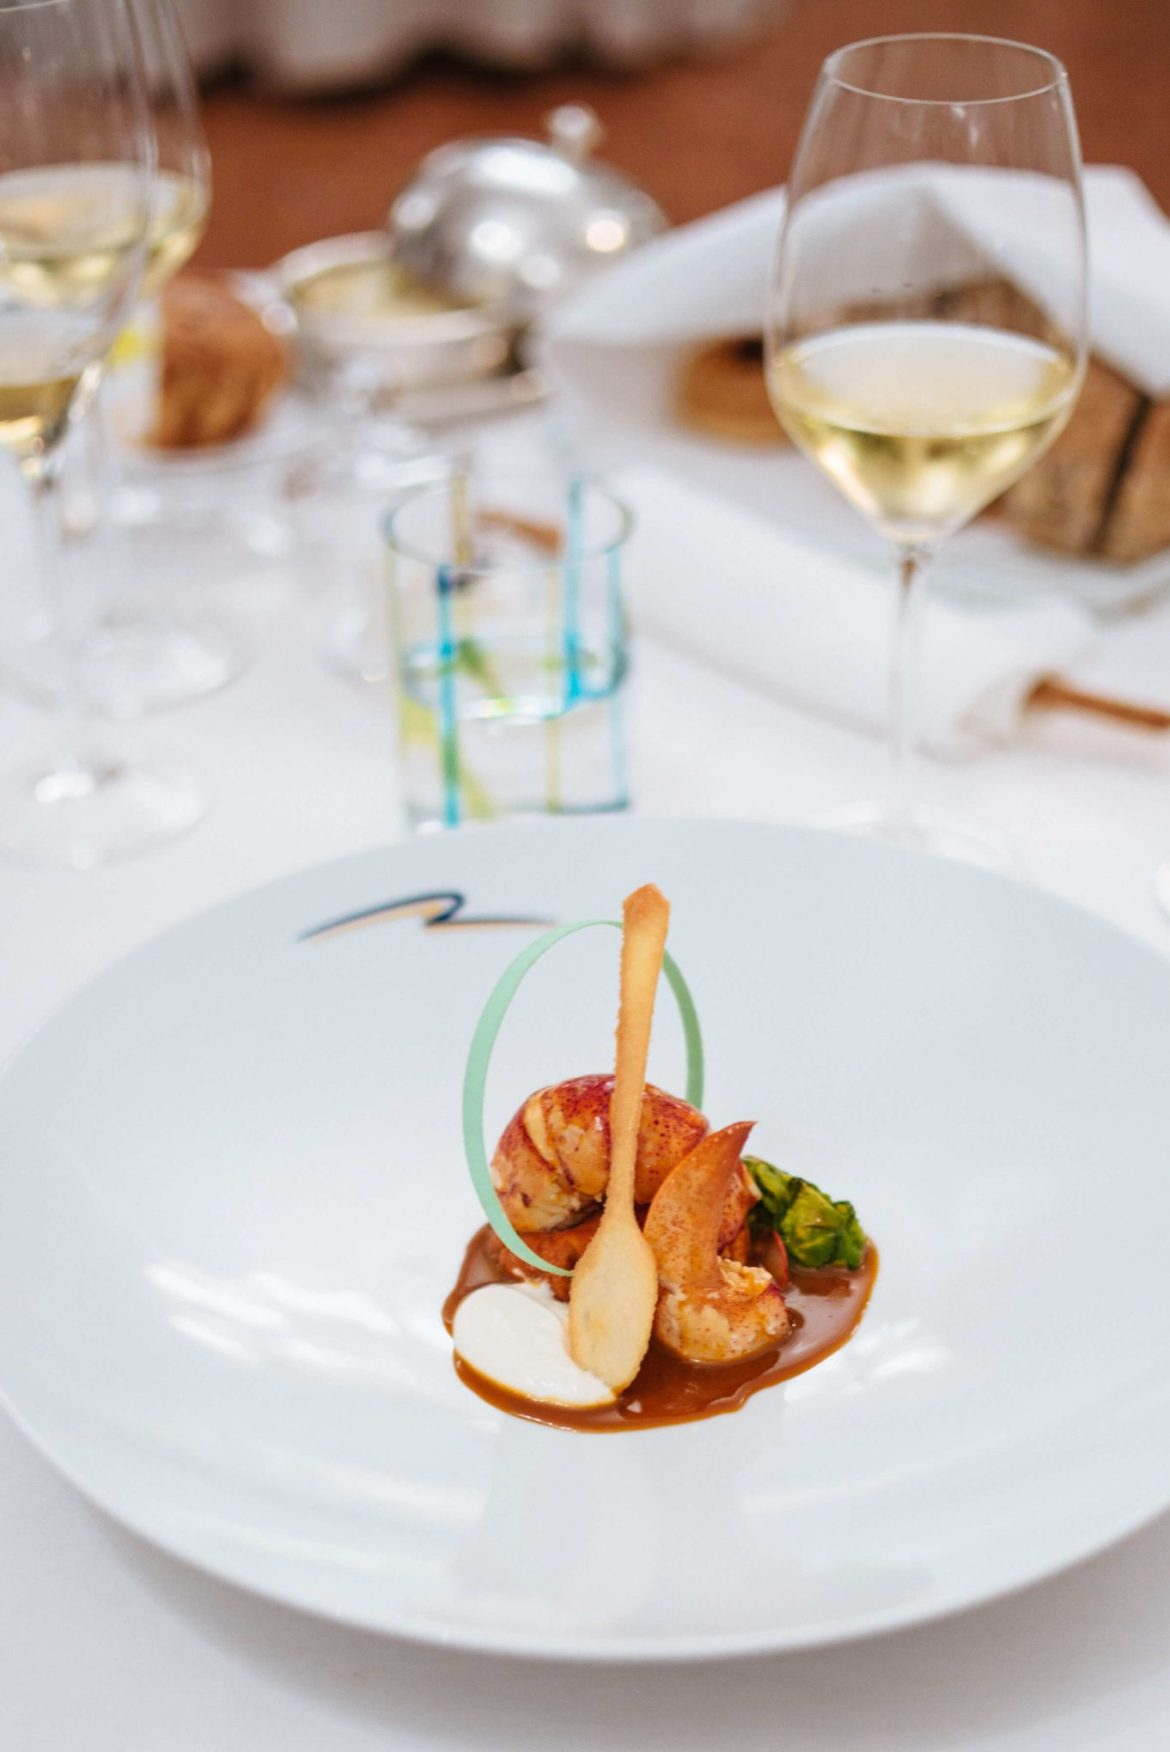 Lobster served at Rossellini's Restaurant in Palazzo Avino, Ravello Italy, The Taste Edit